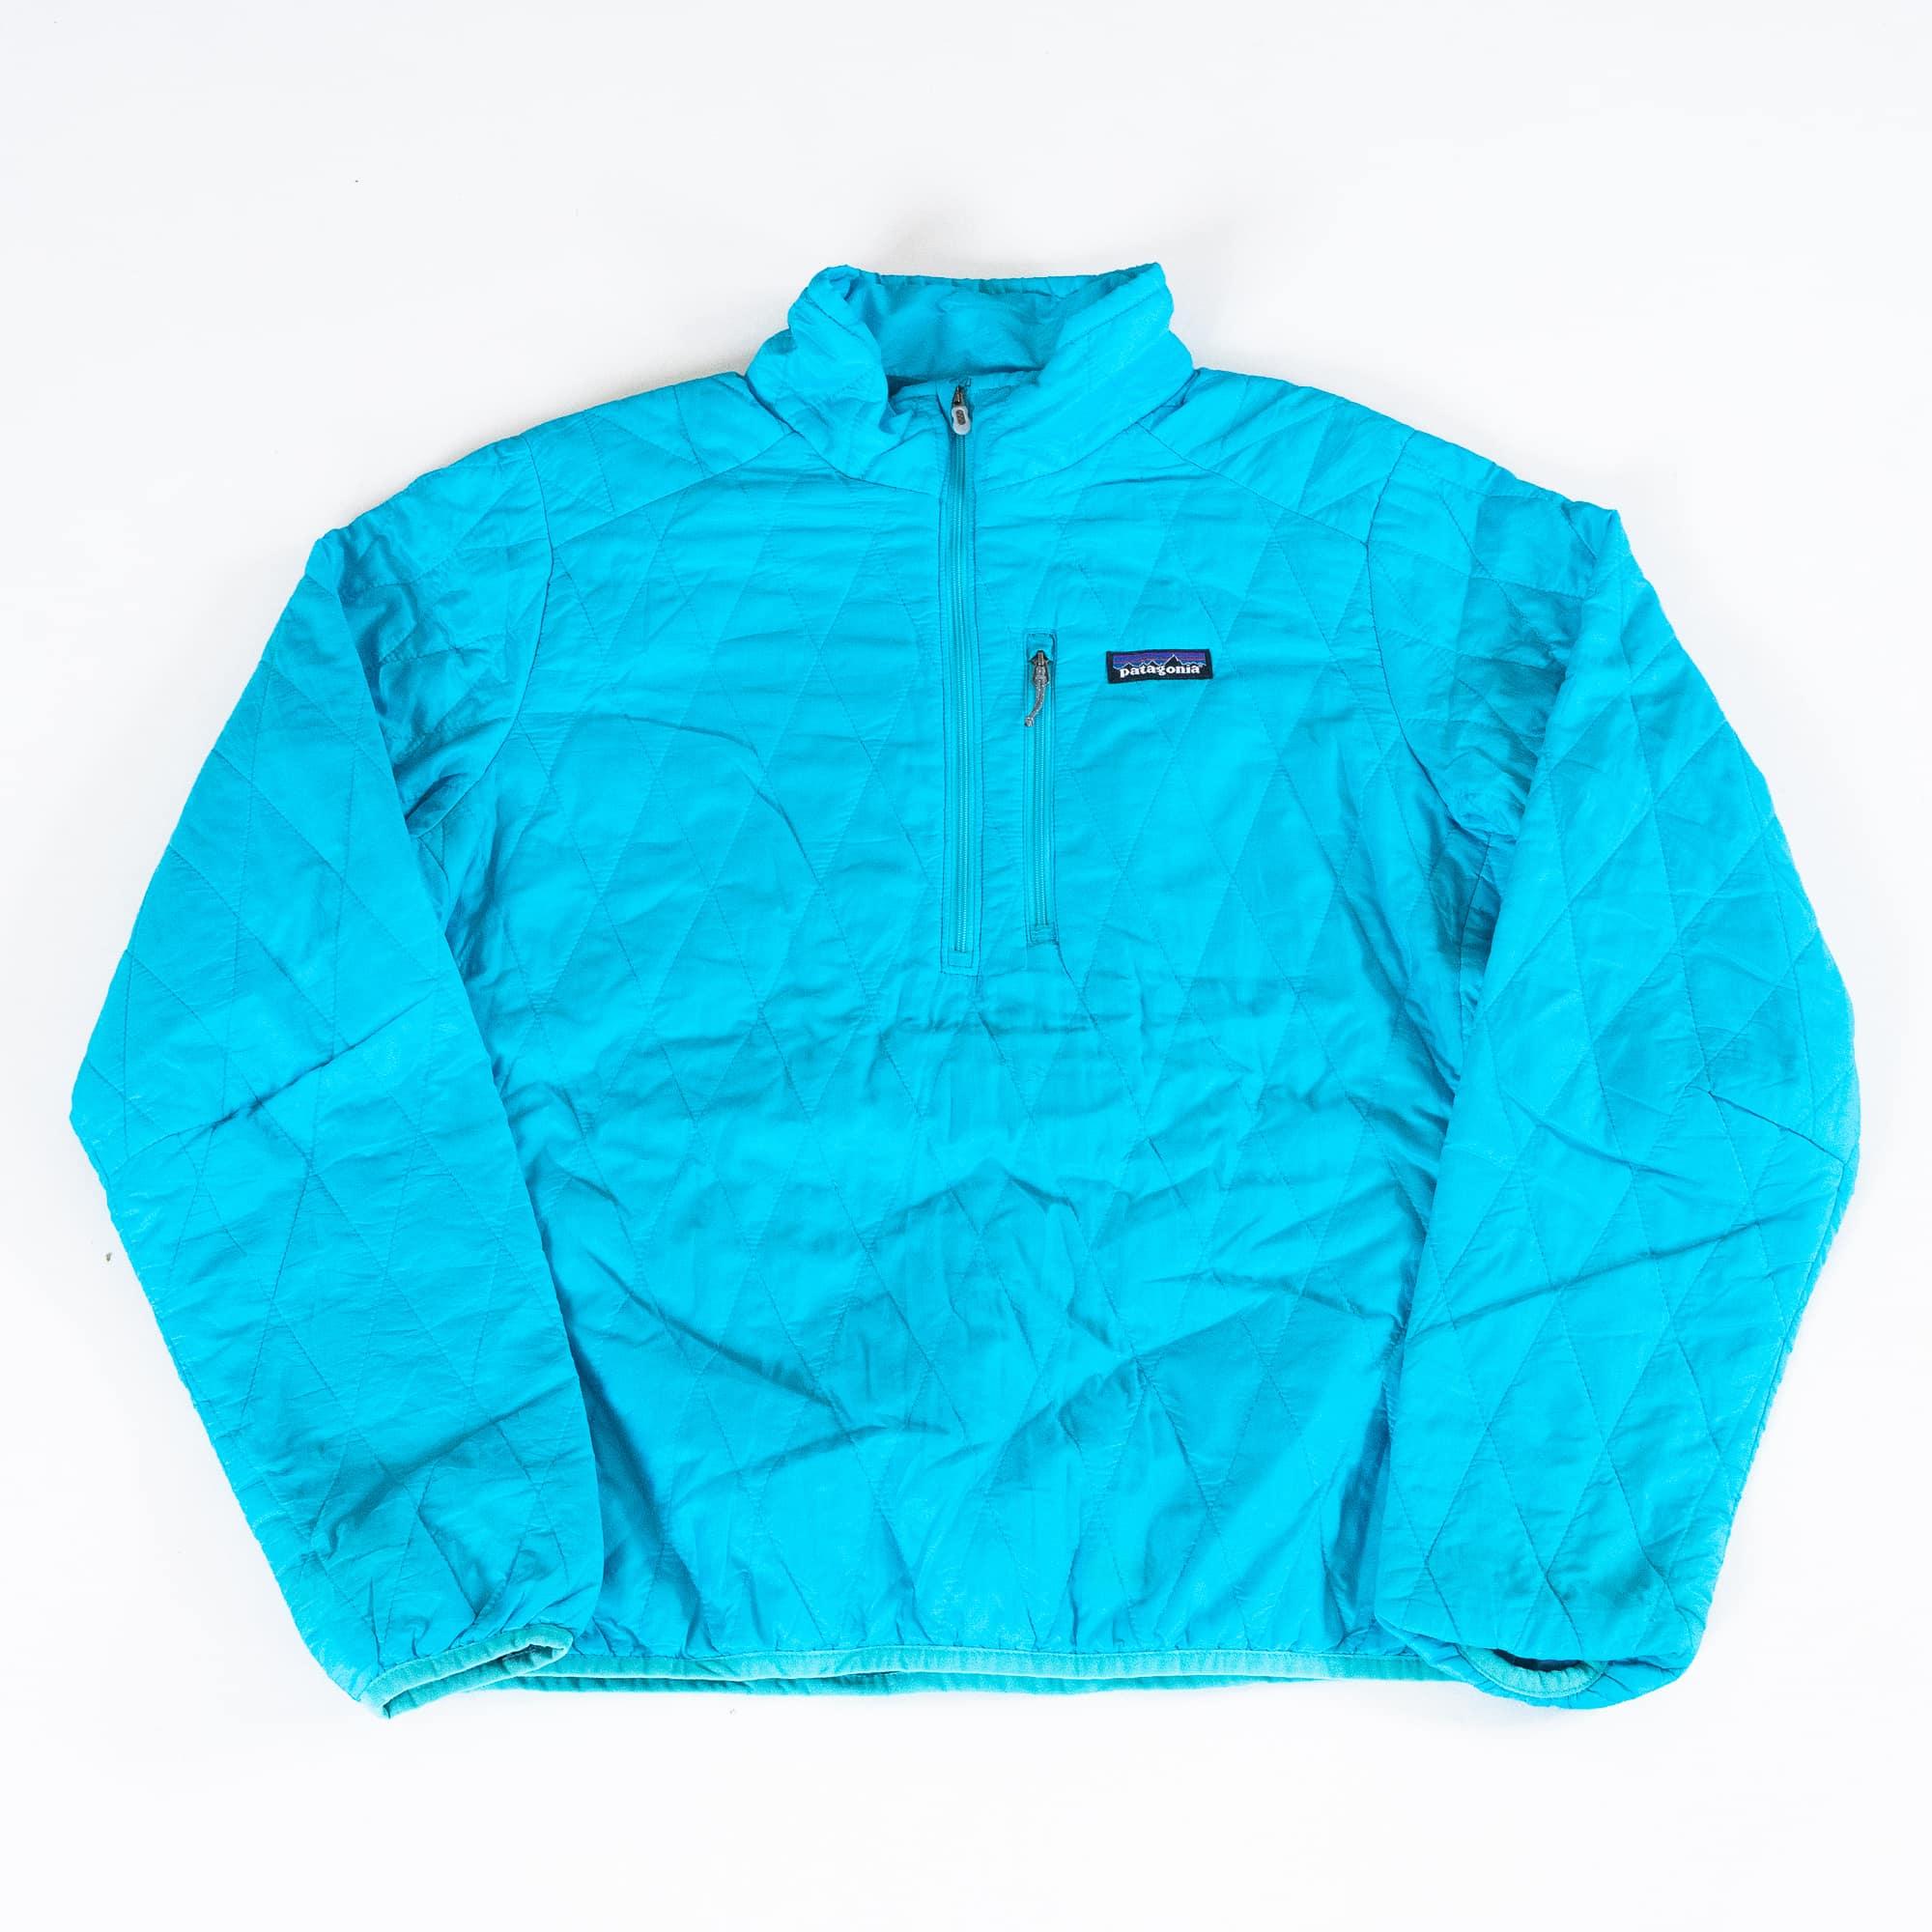 gebraucht kaufen Patagonia Nano Puff Jacke